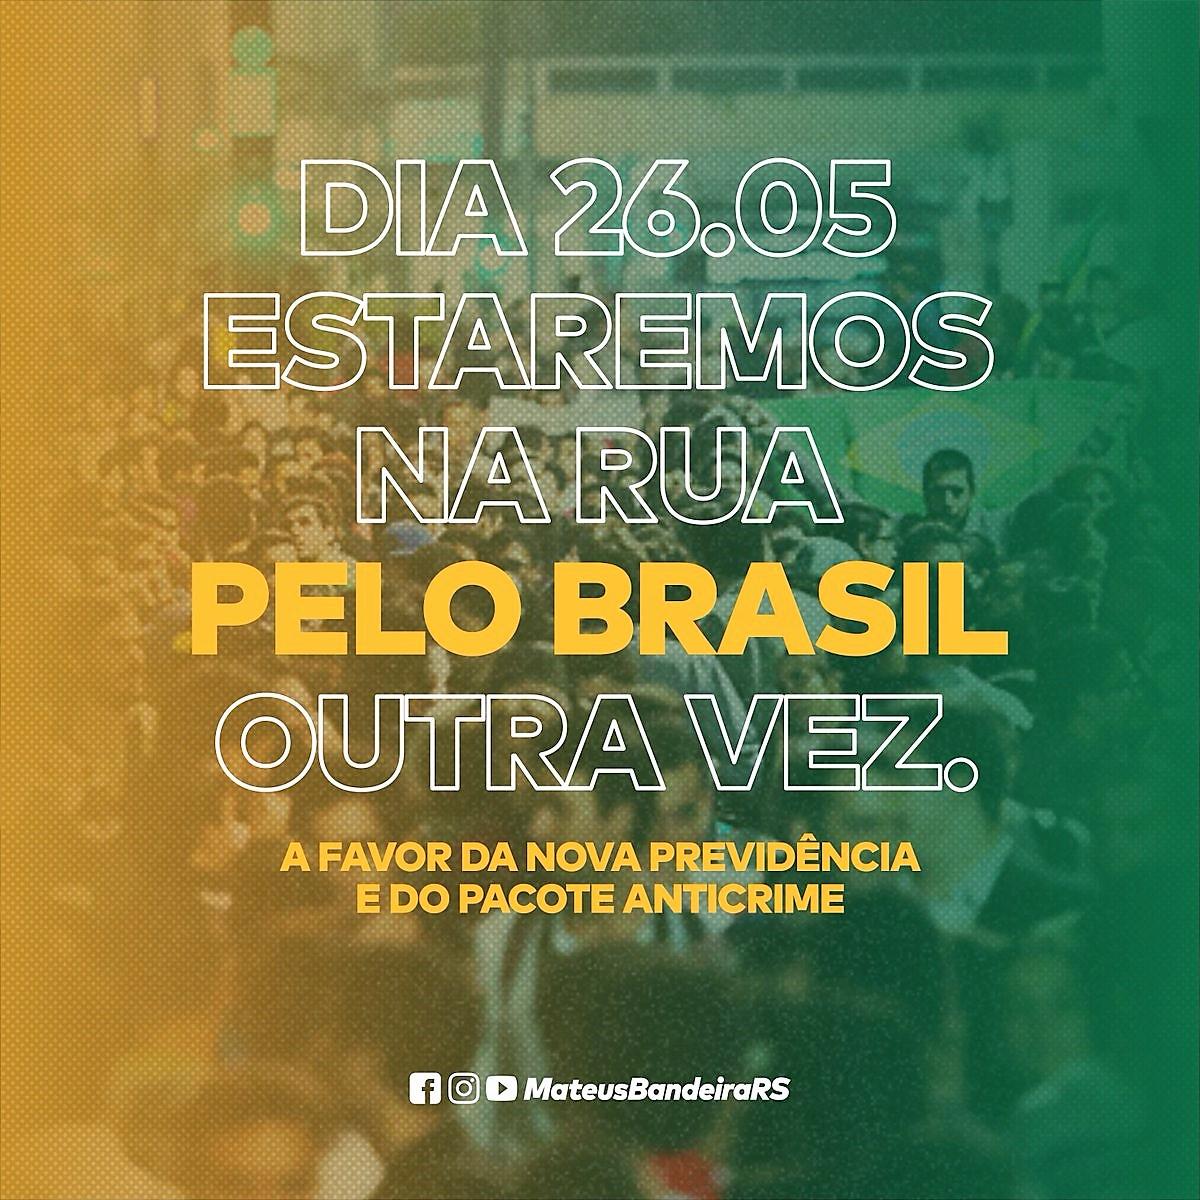 Pelo Brasil, outra vez!